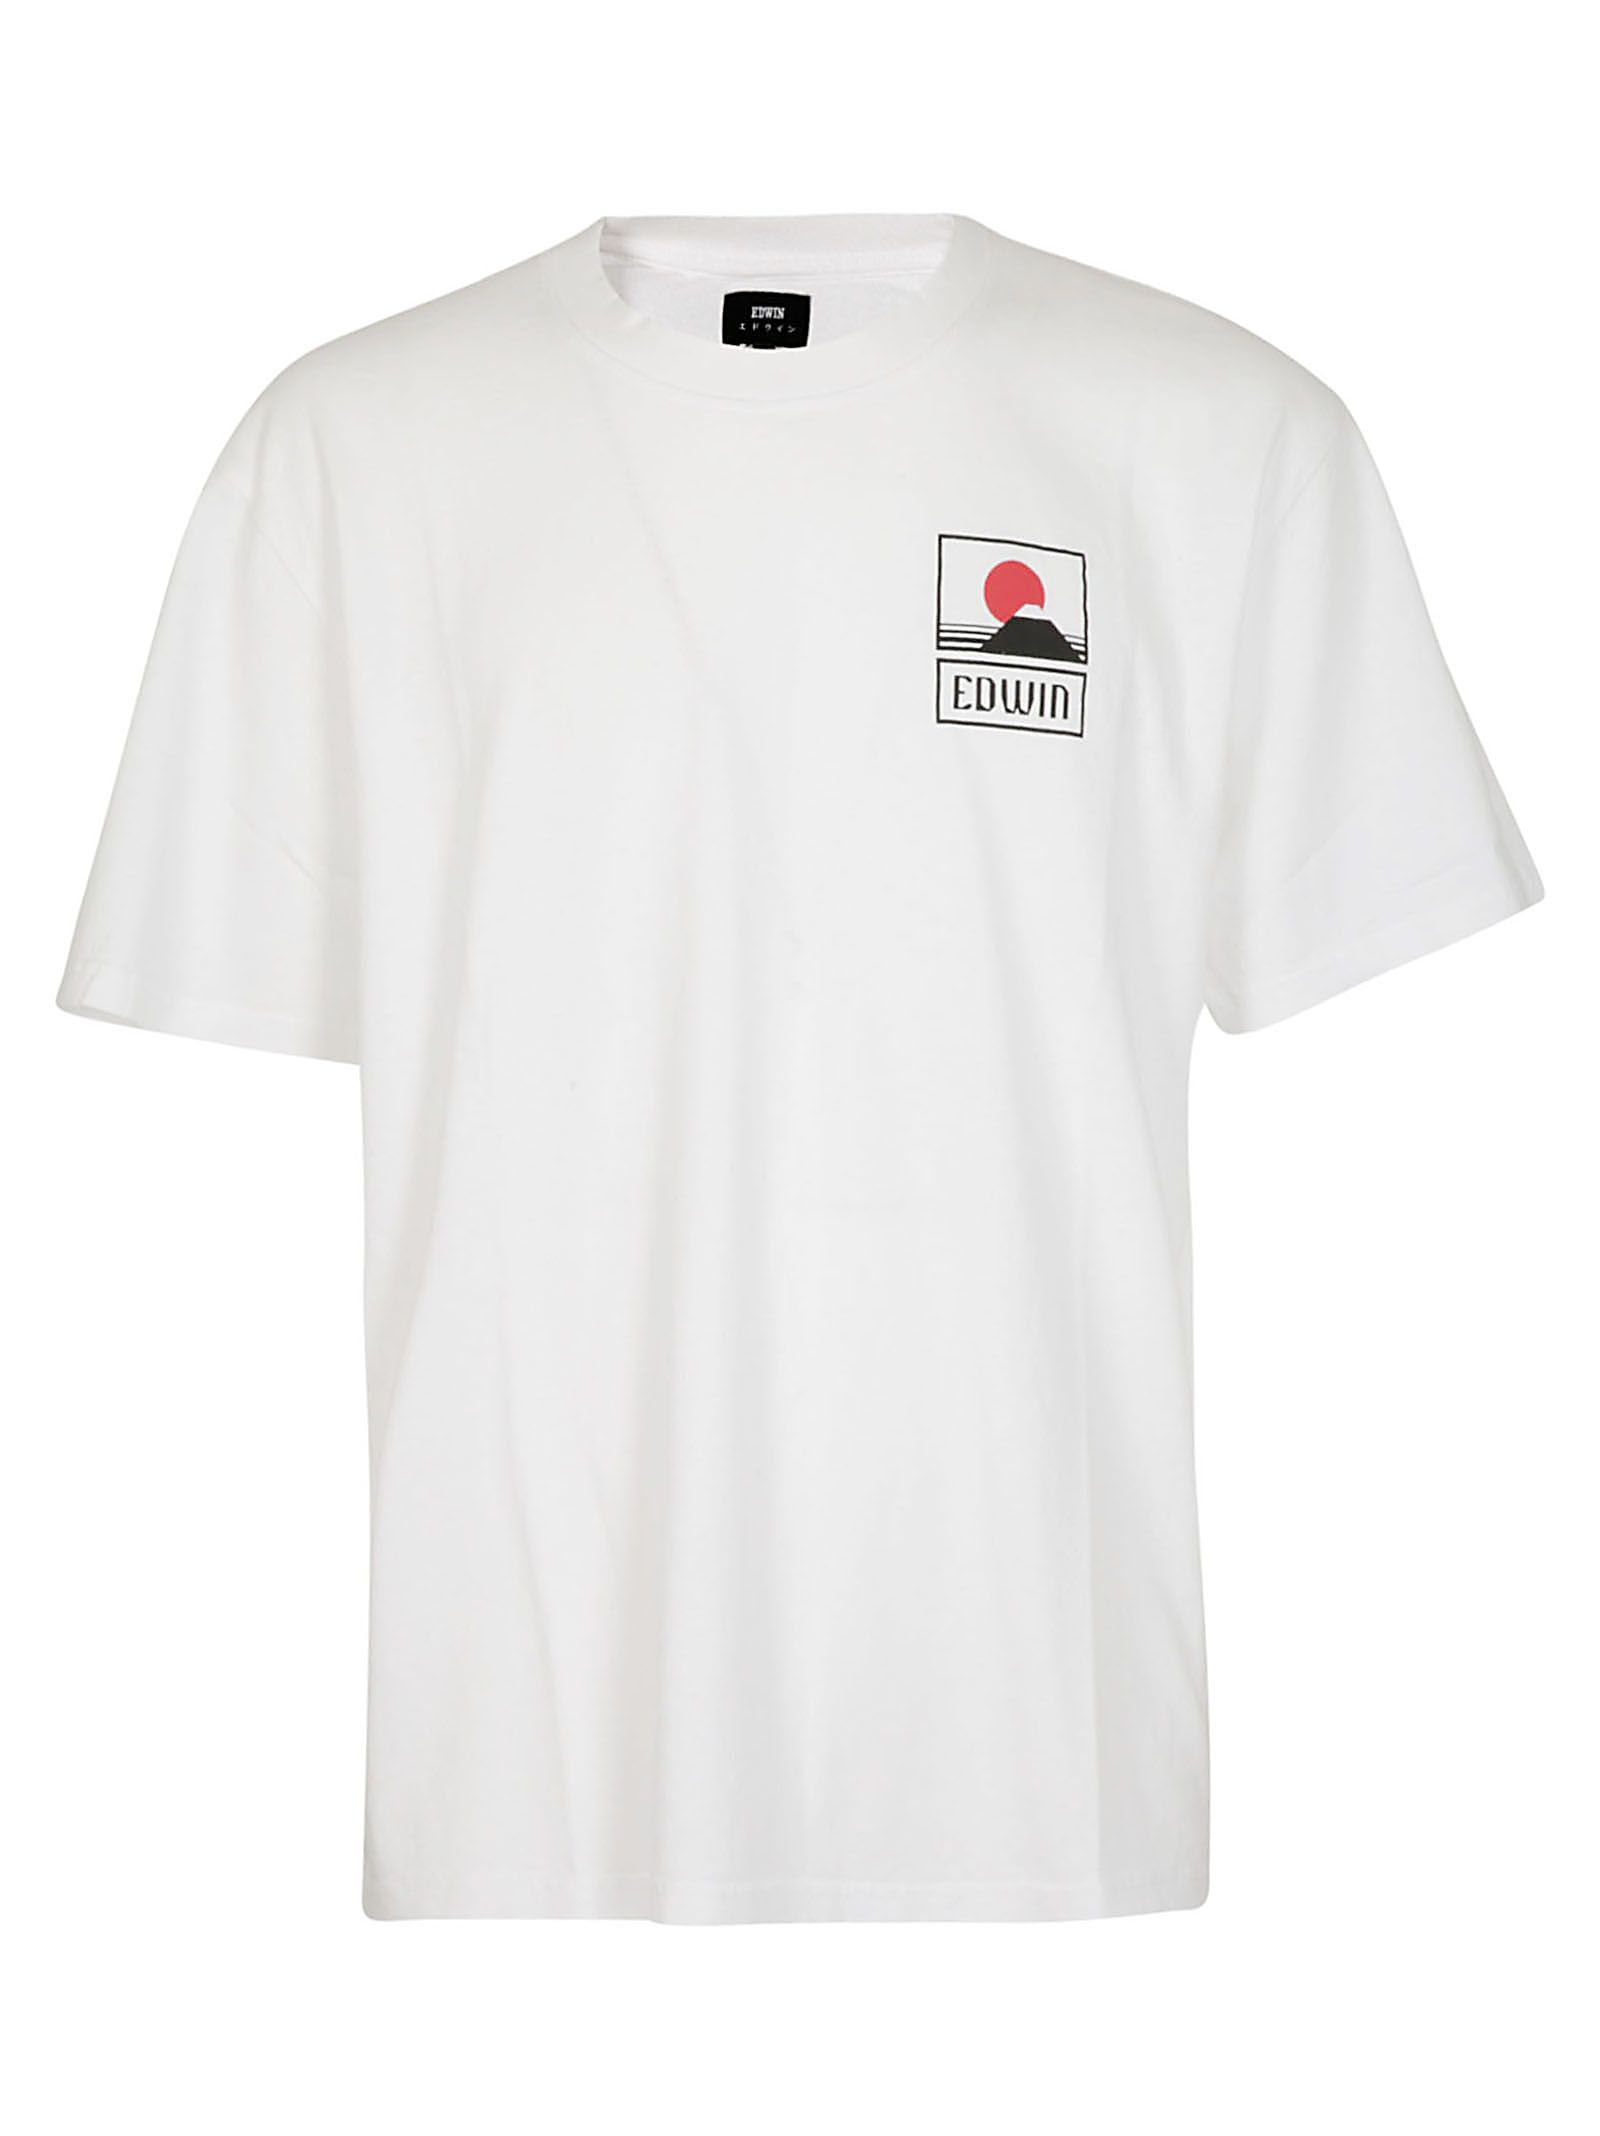 Edwin Printed T-shirt